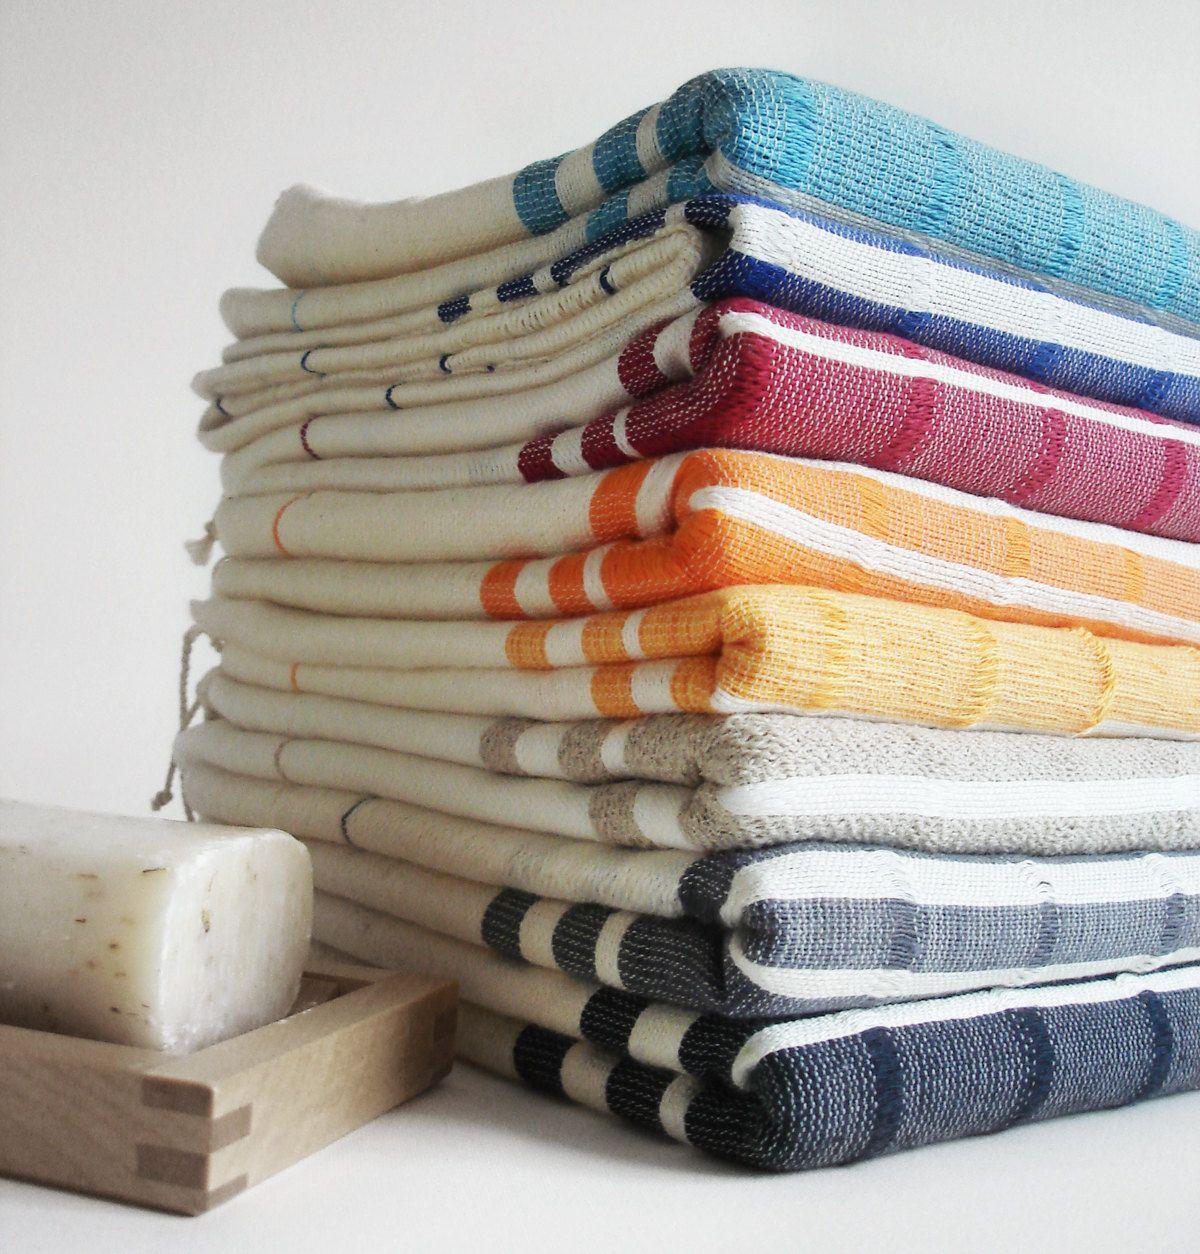 quality turkish bath towel color ful pinterest turkish bath rh pinterest com